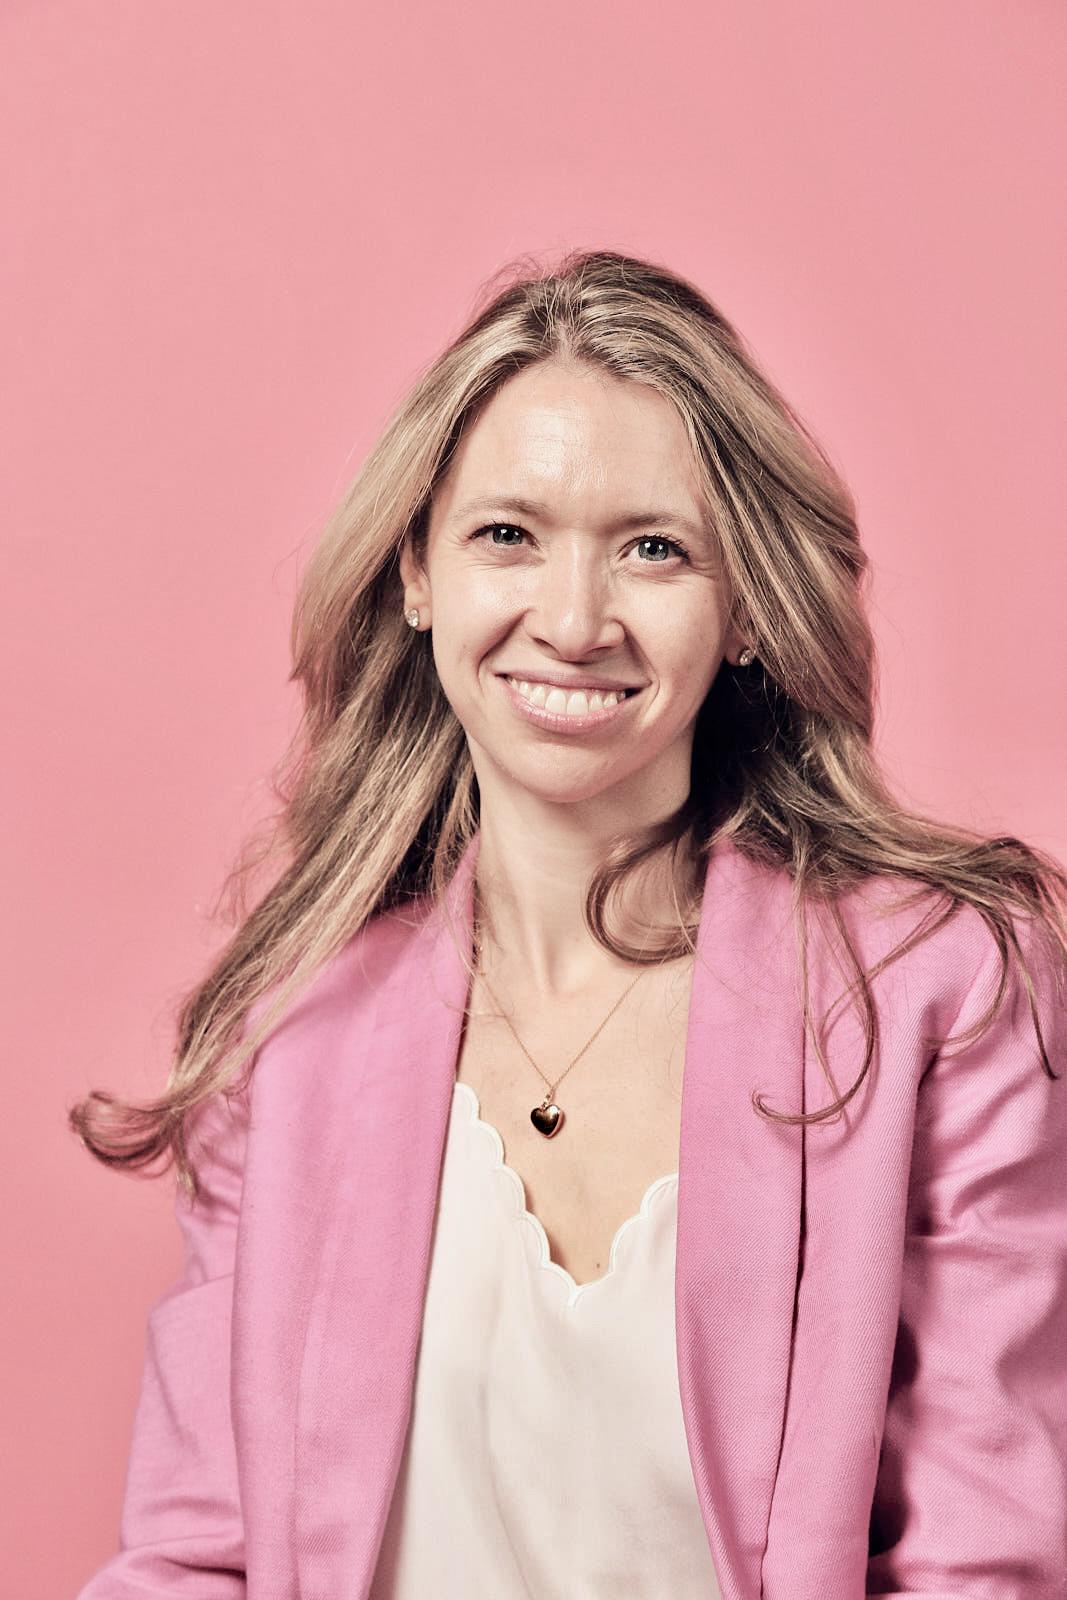 Danielle Kahane